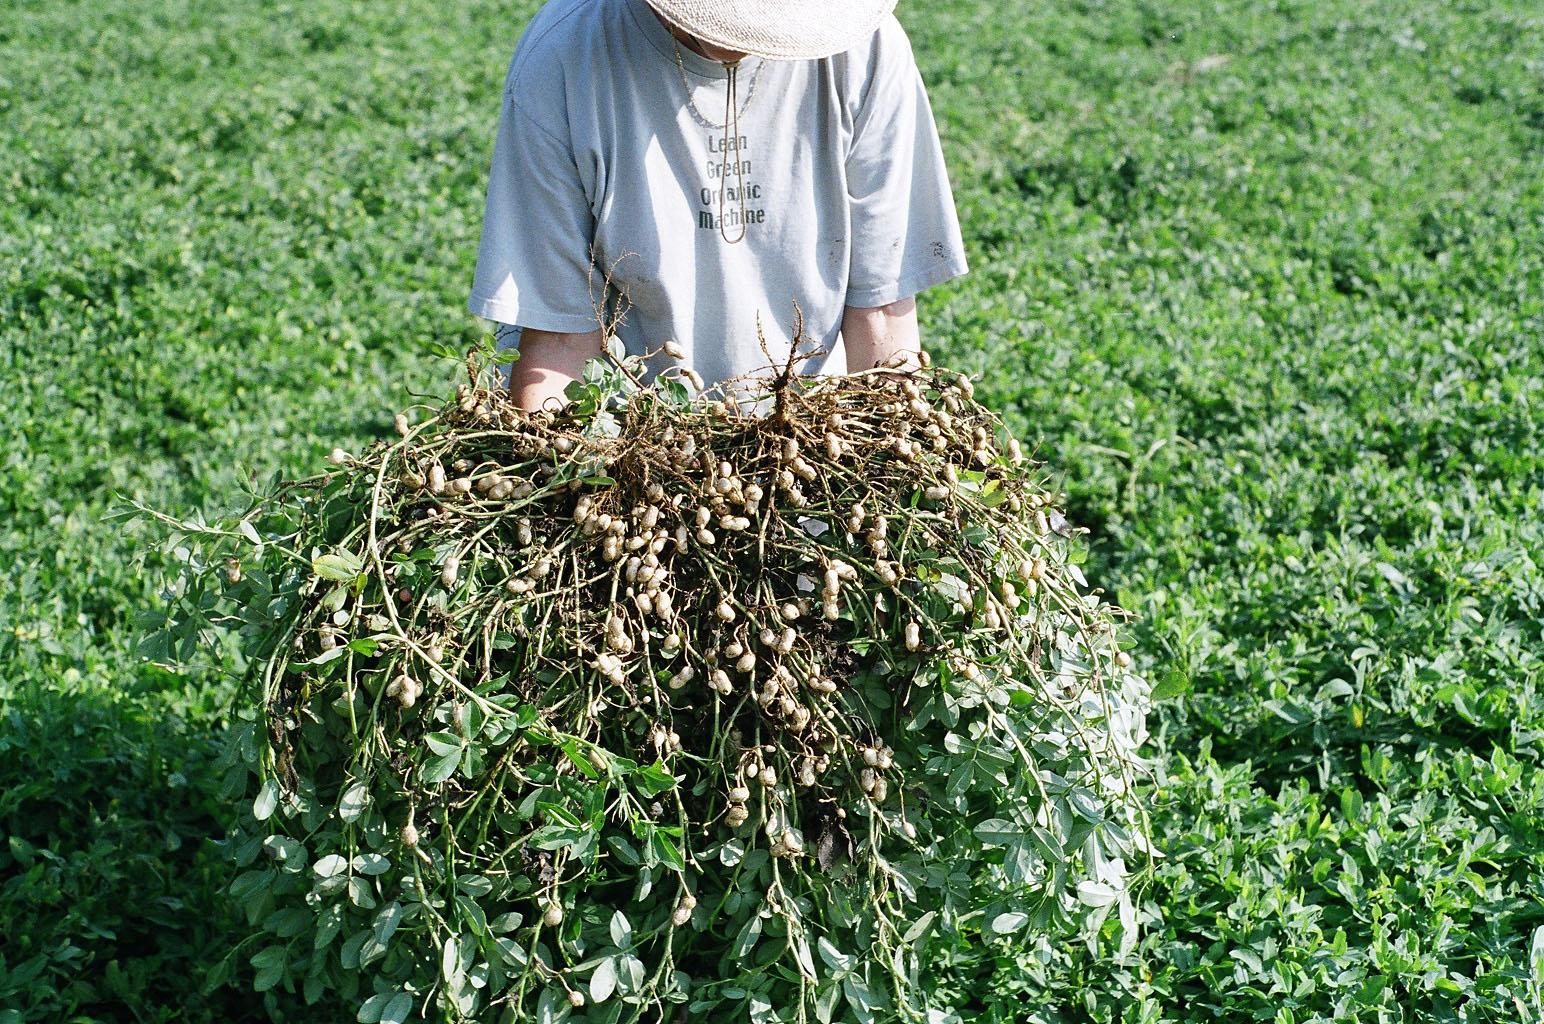 Georgia farmer Relinda Walker displays organic peanuts on her farm.